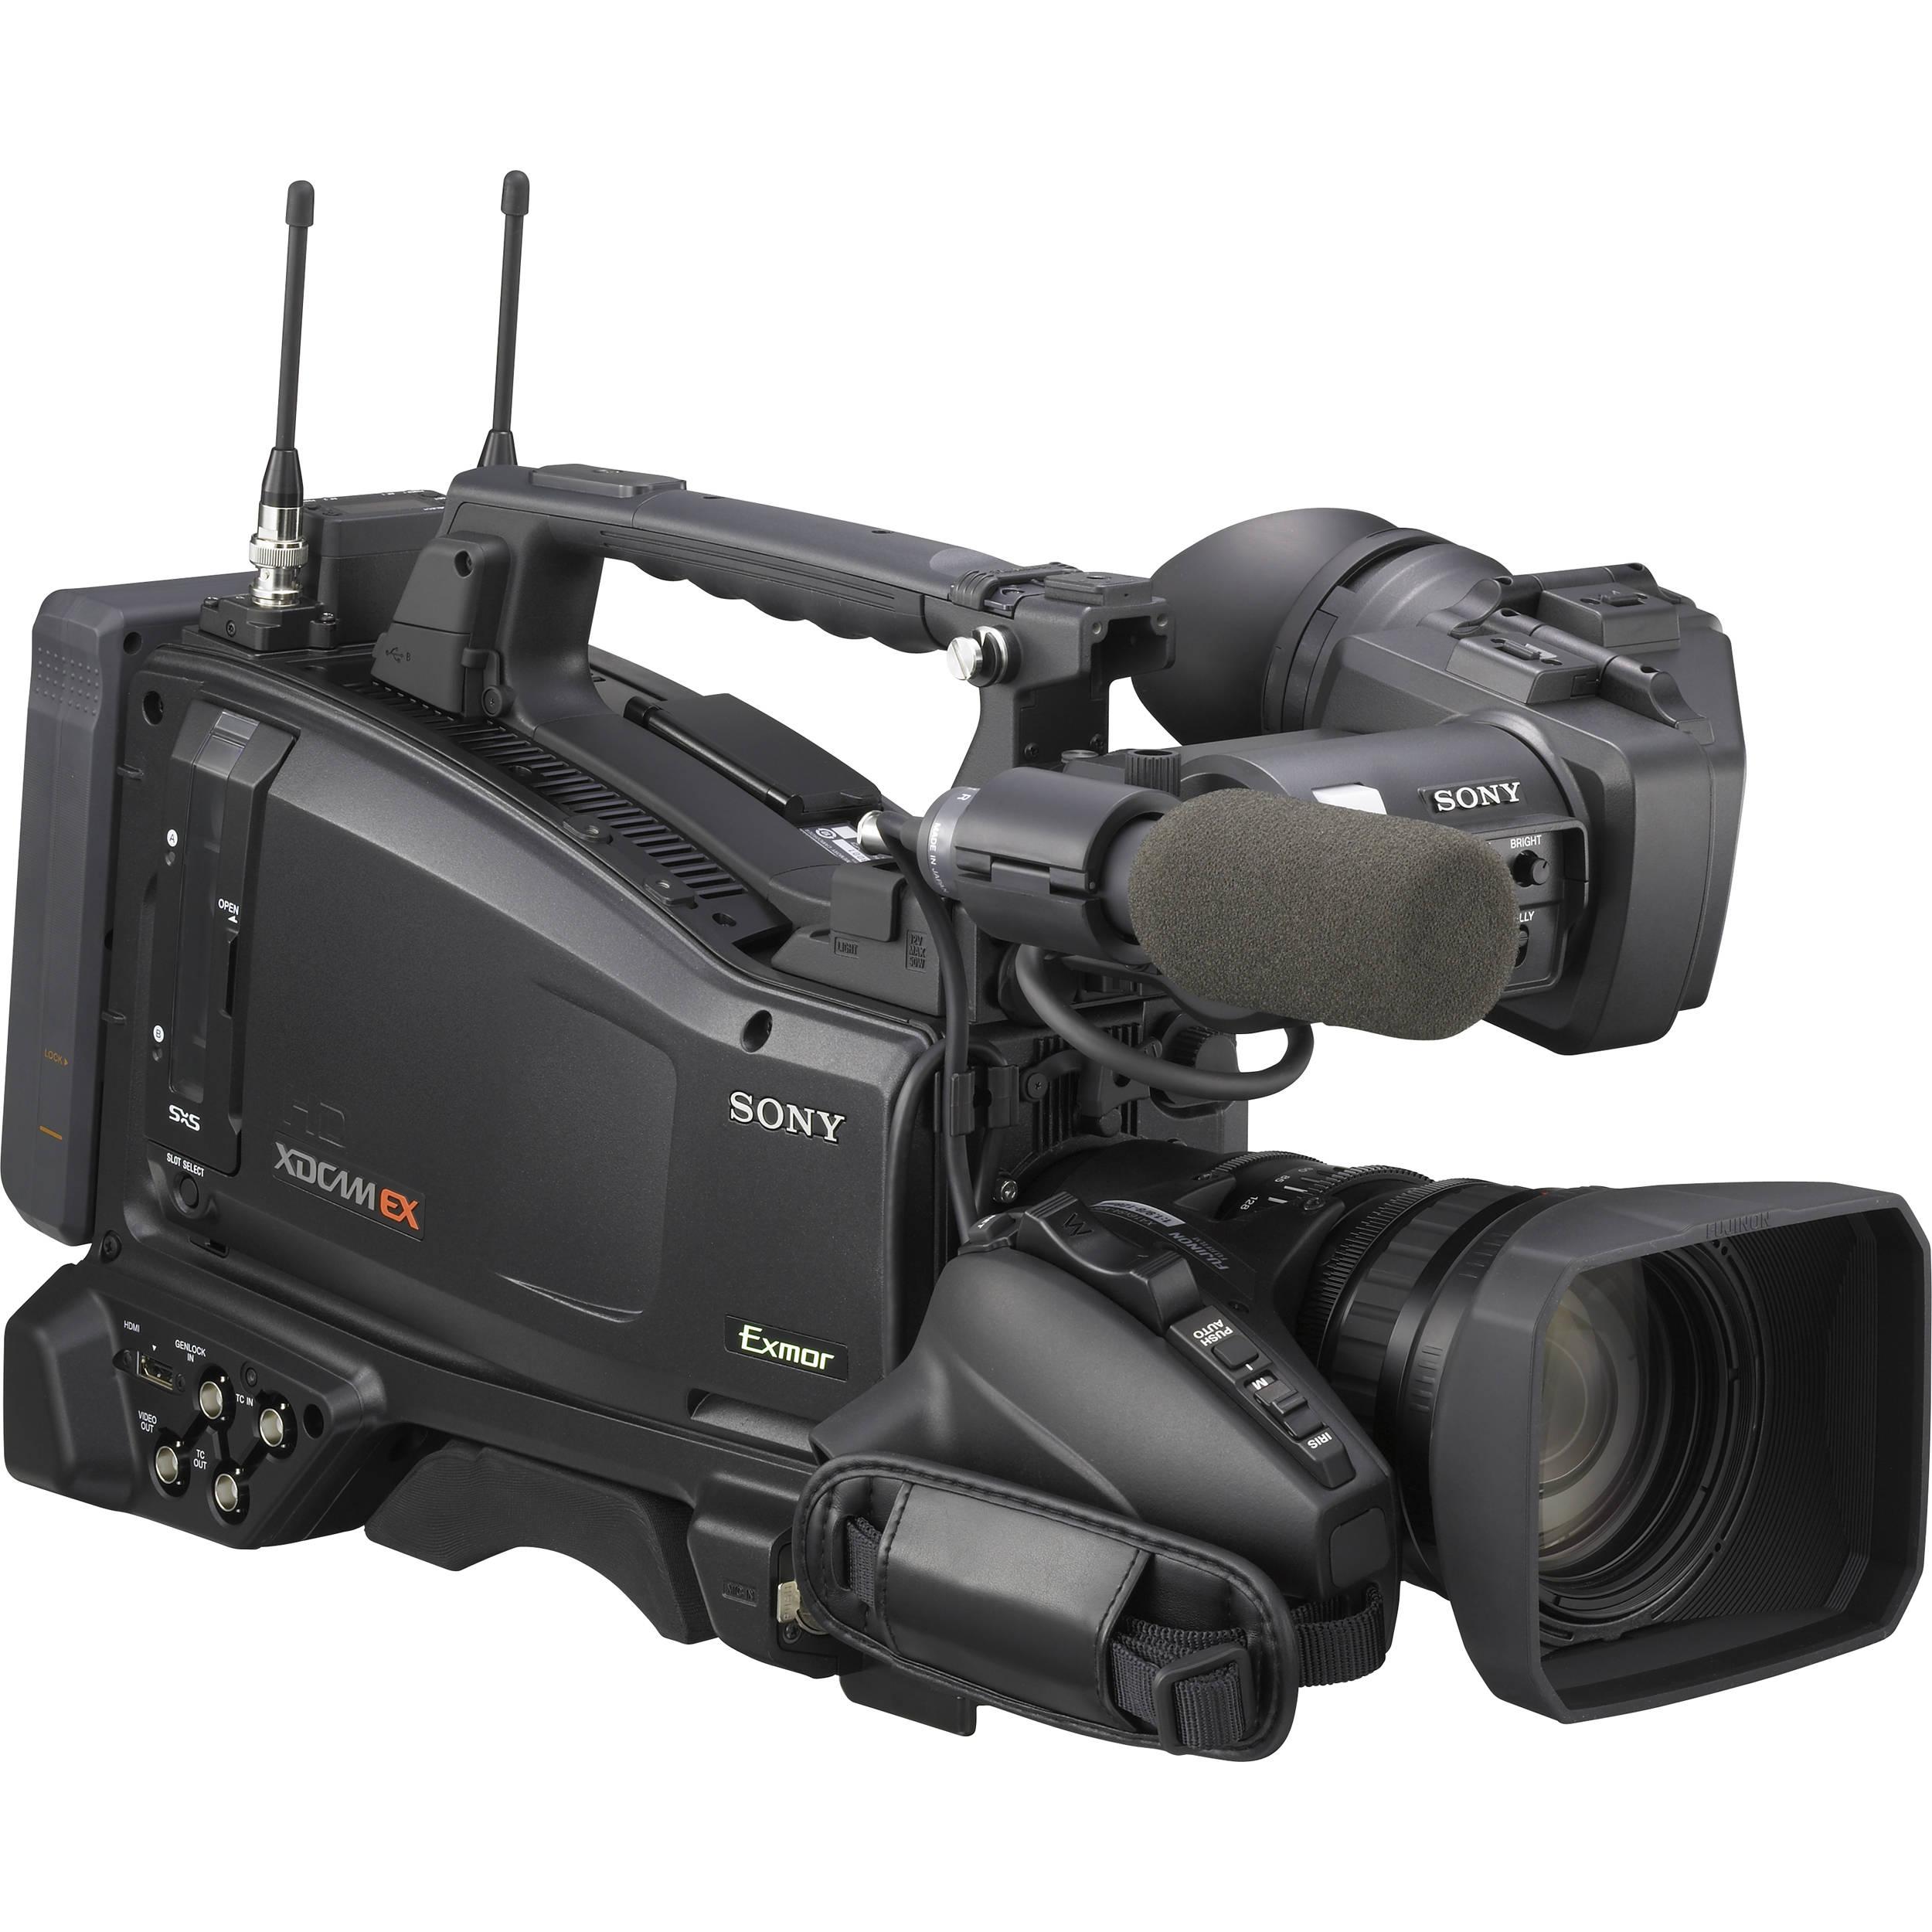 Sony Pmw 350k Xdcam Ex Hd Camcorder W 16x Zoom Lens Bh Camera Replay Xd1080 Full